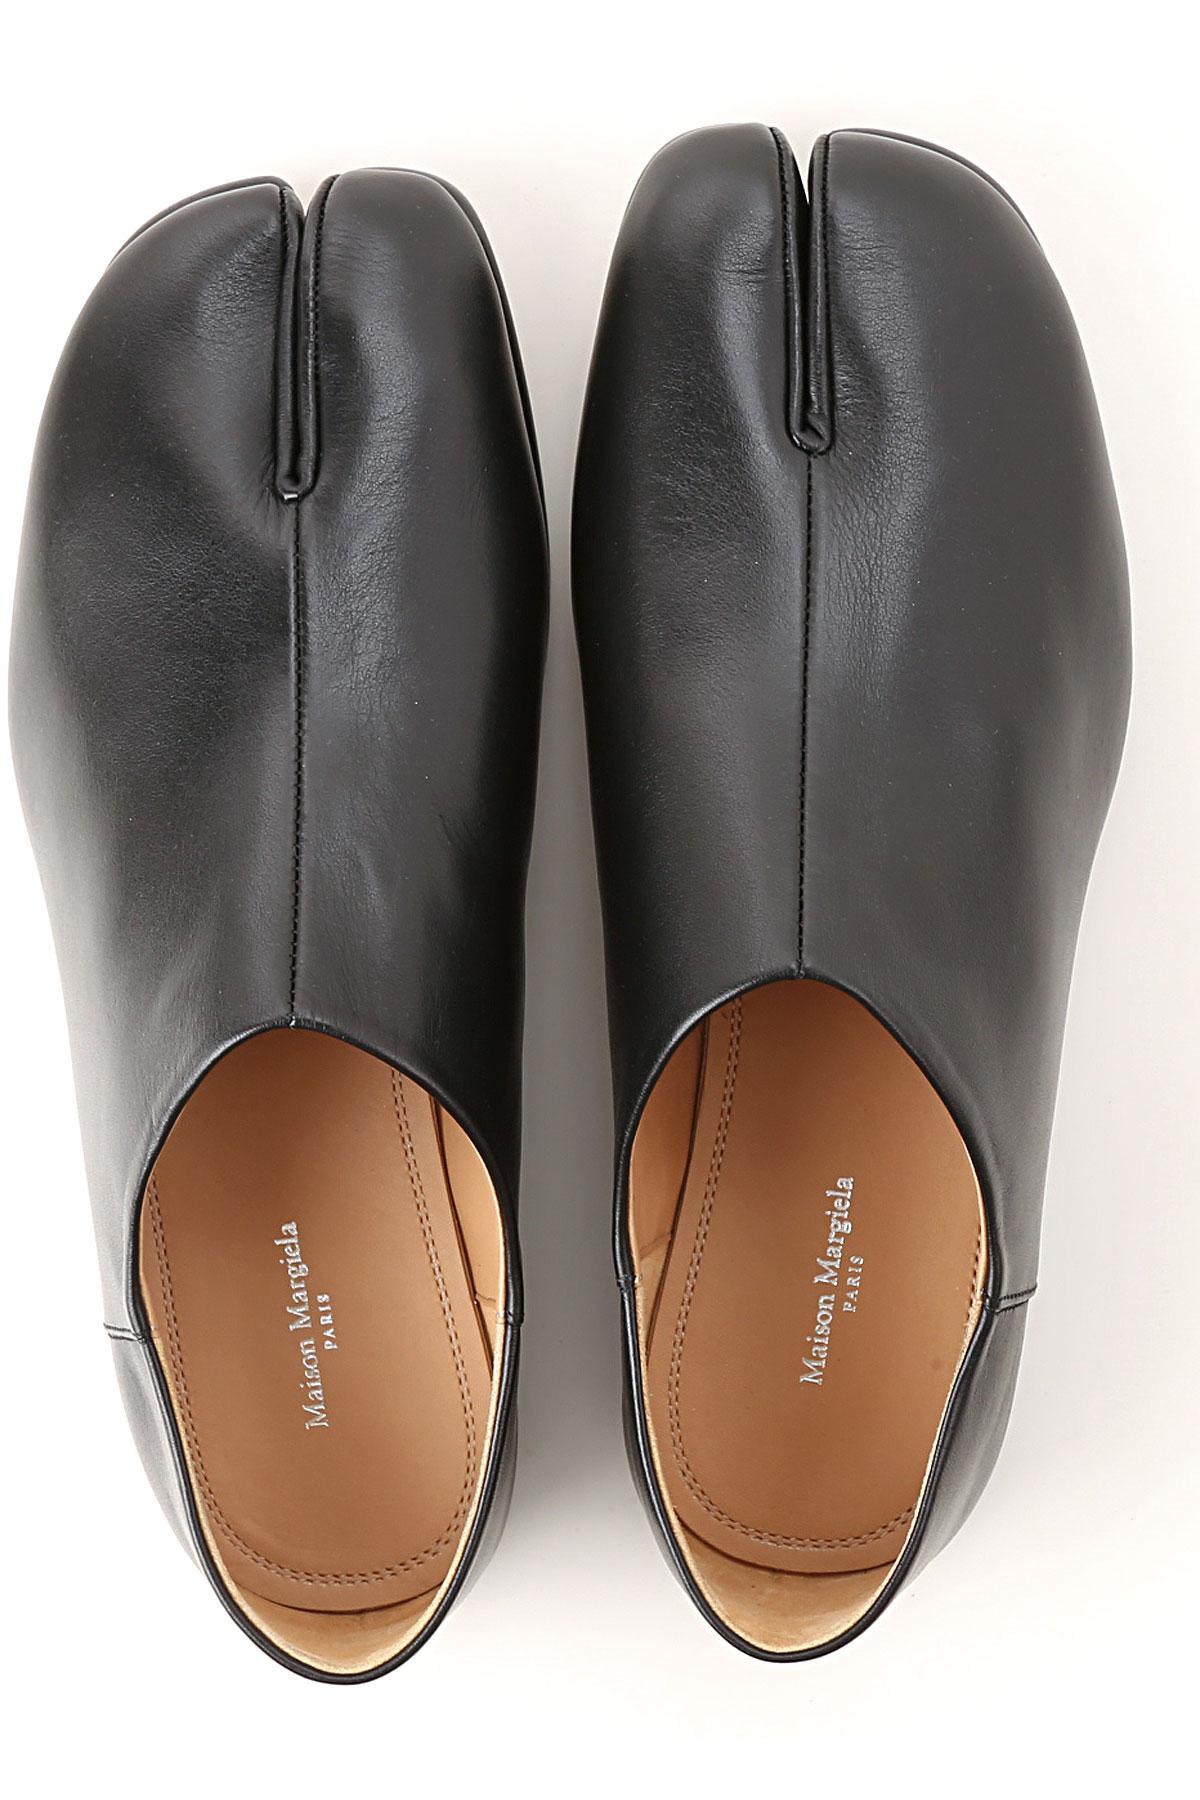 Zapatos Primavera Margiela verano Para nbsp; Martin Maison Negro 2019 Hombres n1XEq5x